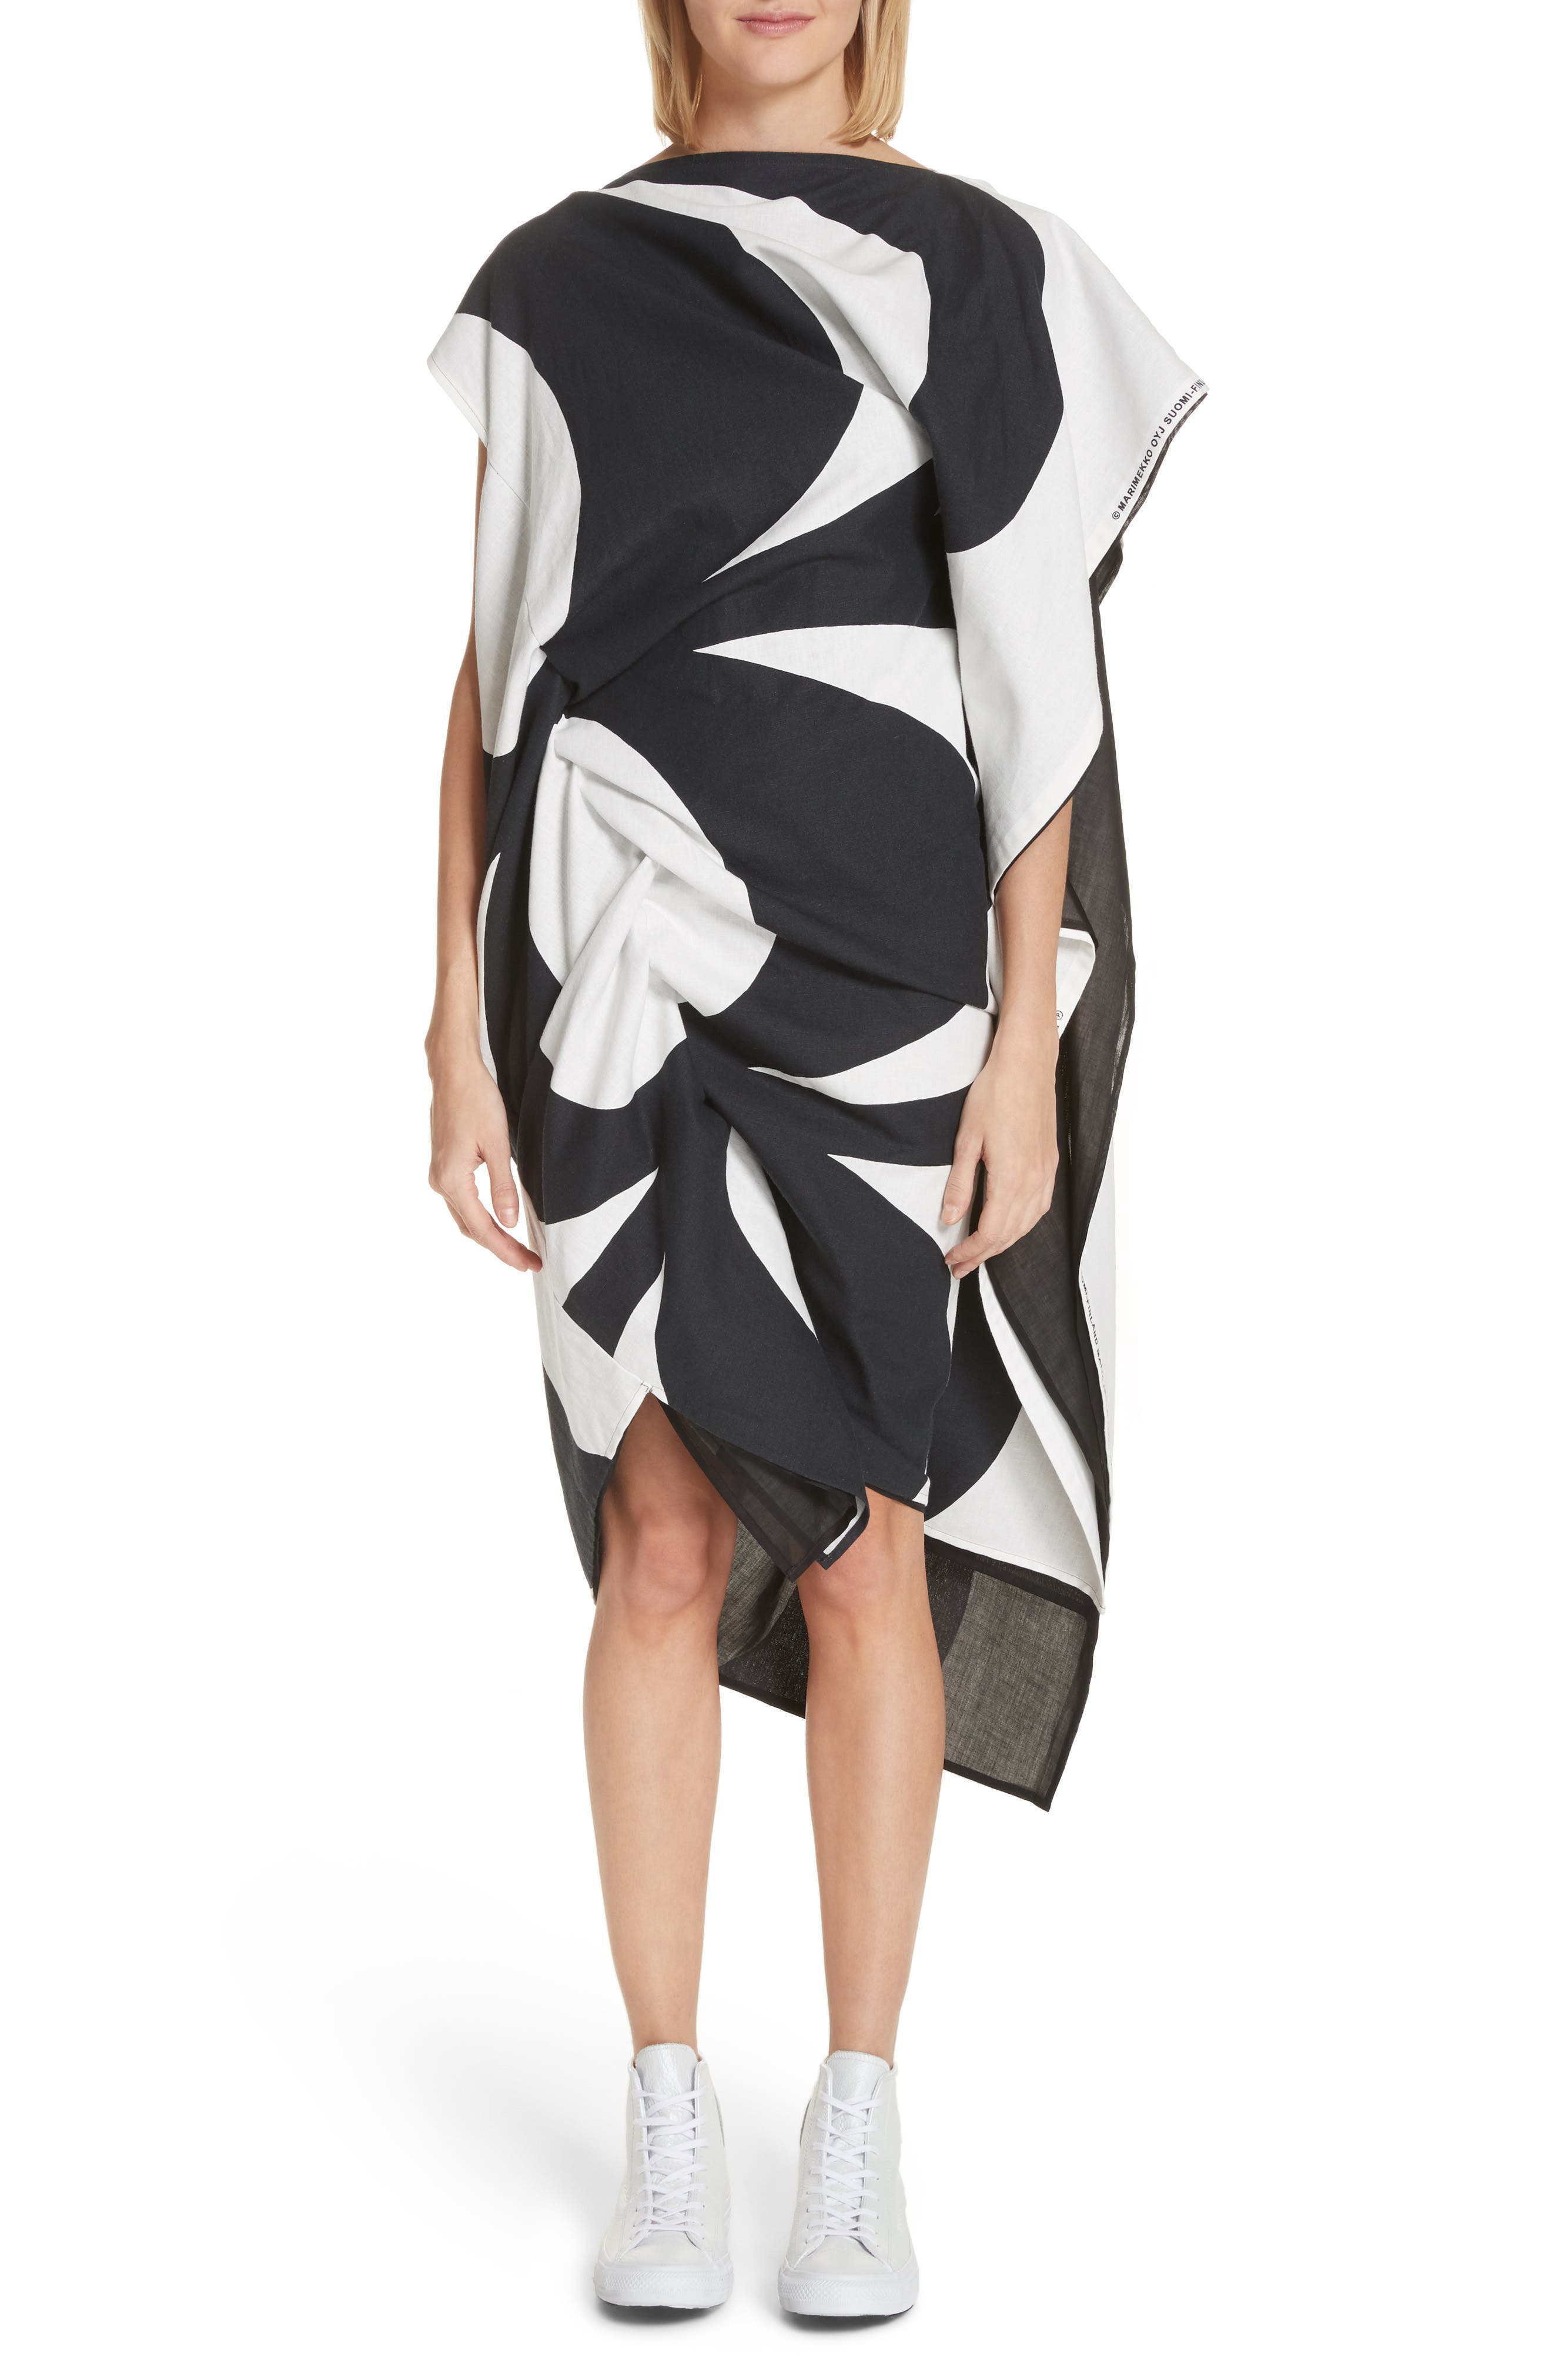 Circular Print Asymmetrical Draped Dress,                             Main thumbnail 1, color,                             Wht/ Blk X Blk